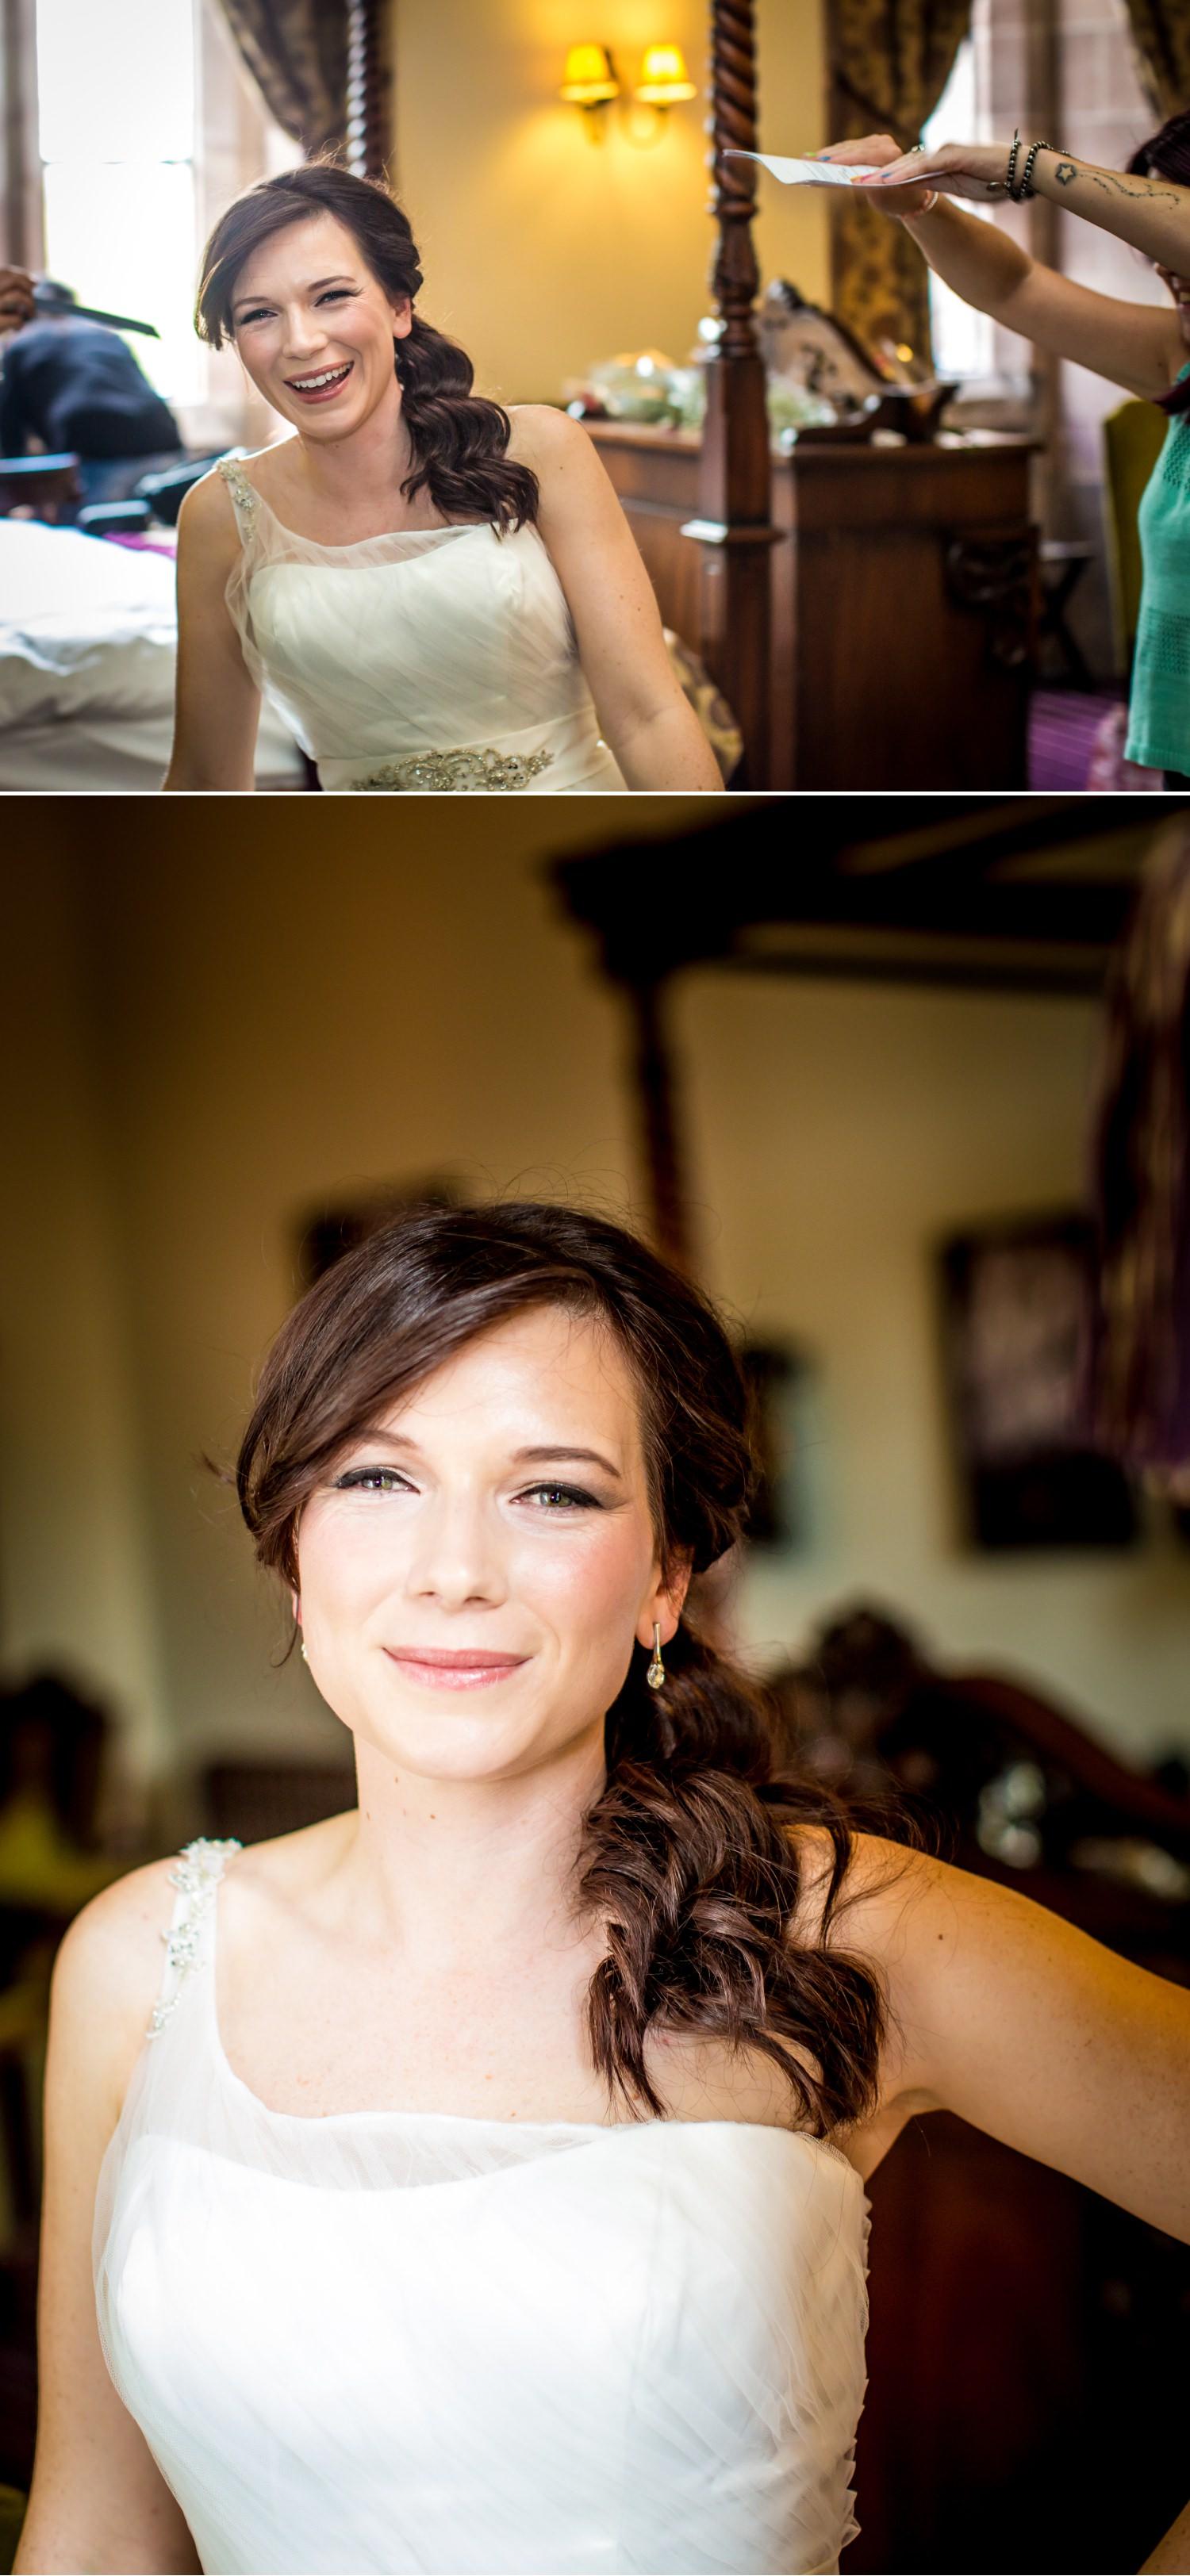 wedding photography portraits in Peckforton Castle, Chester